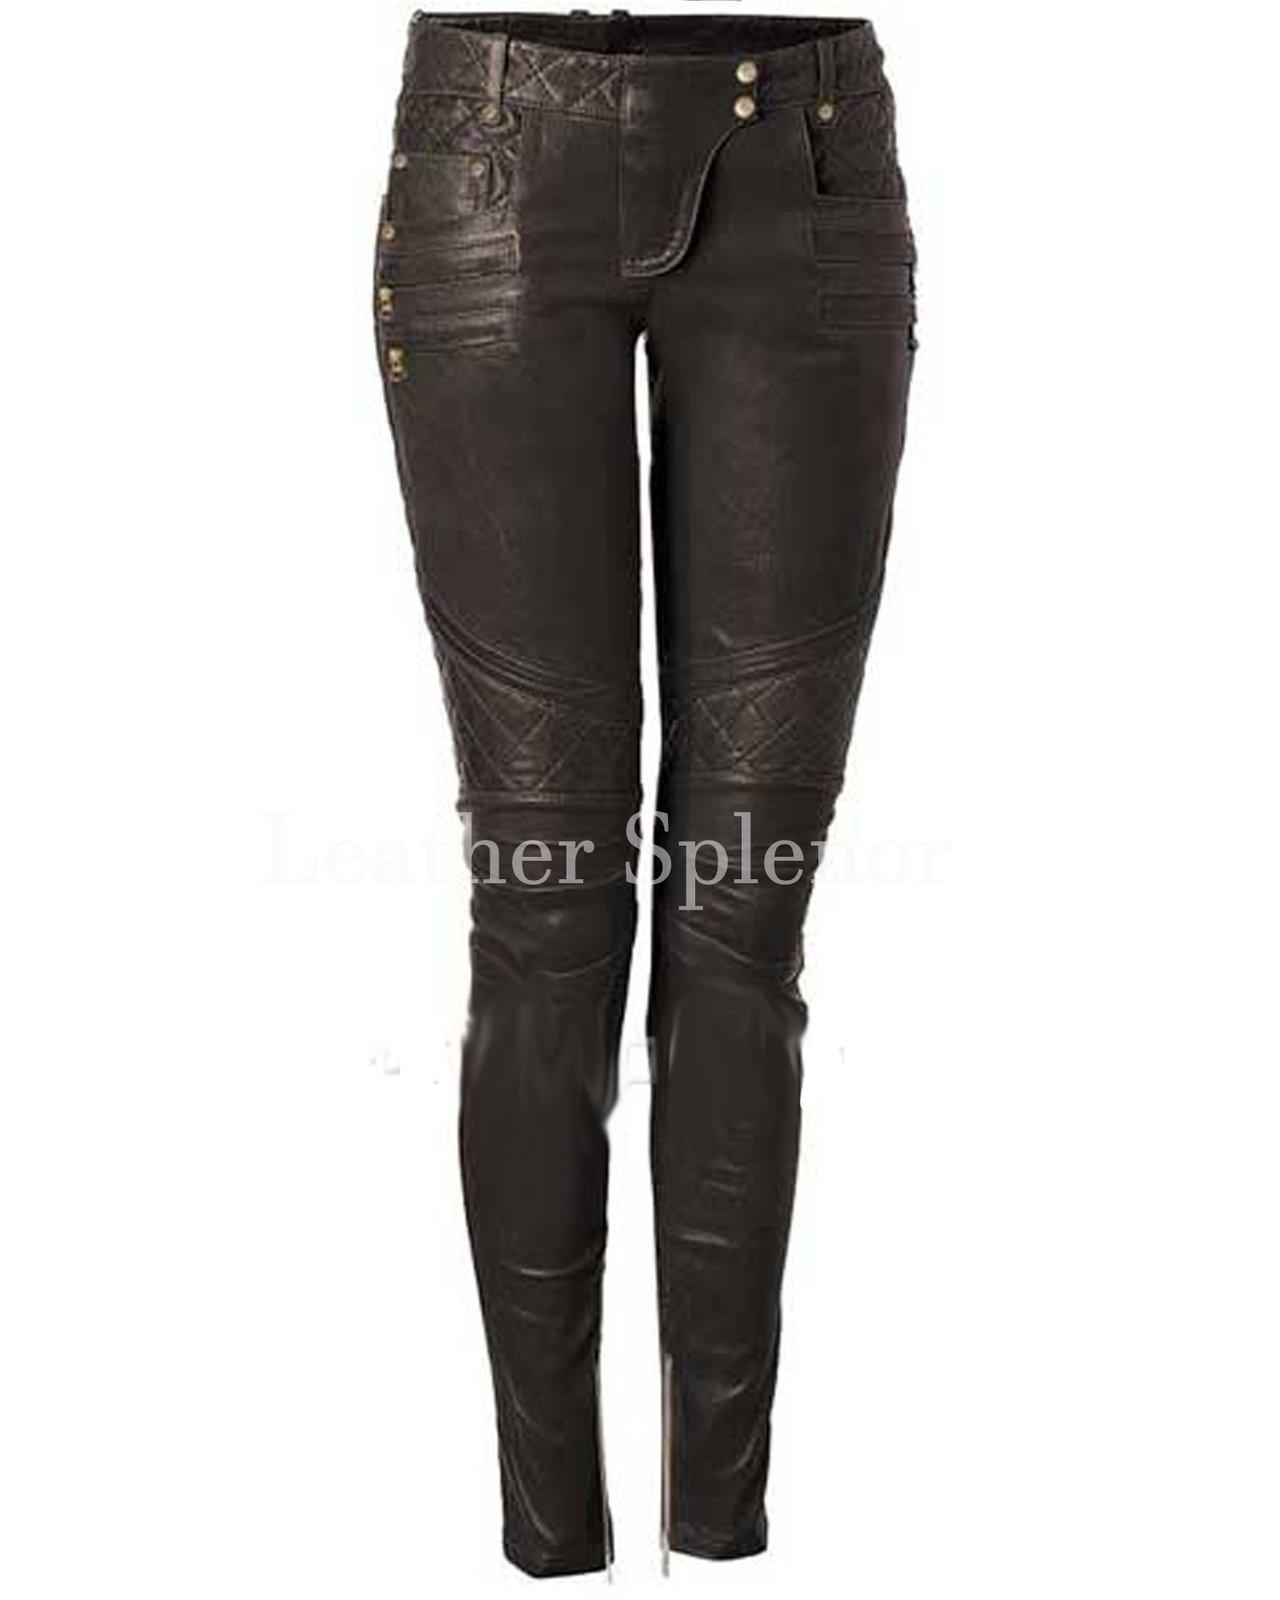 Biker Style Women Paneled Leather Pant